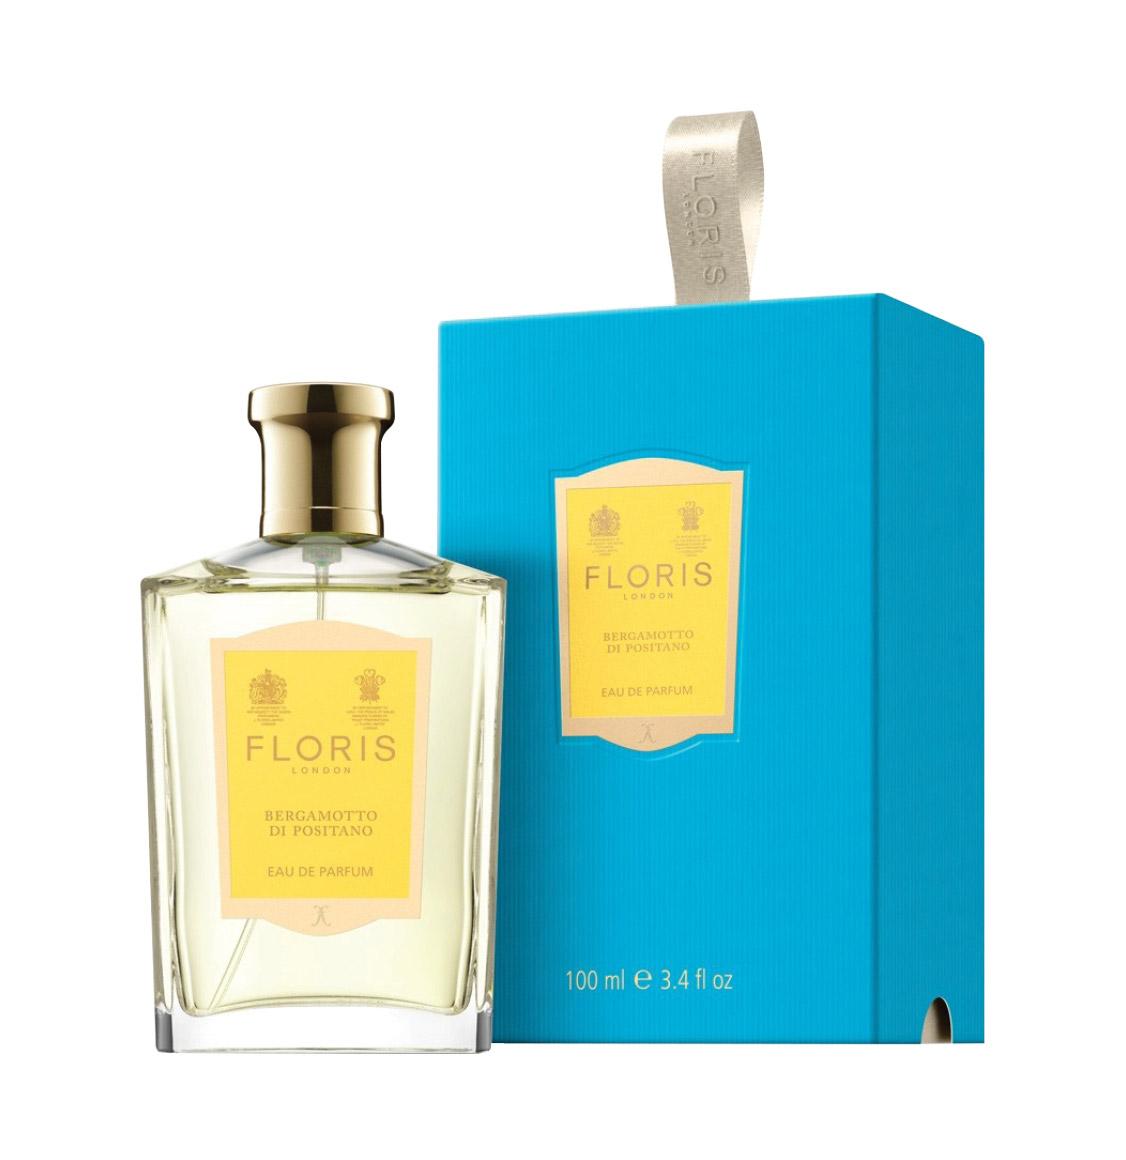 Floris London Bergamotto di Positano Eau de Parfum 100ml